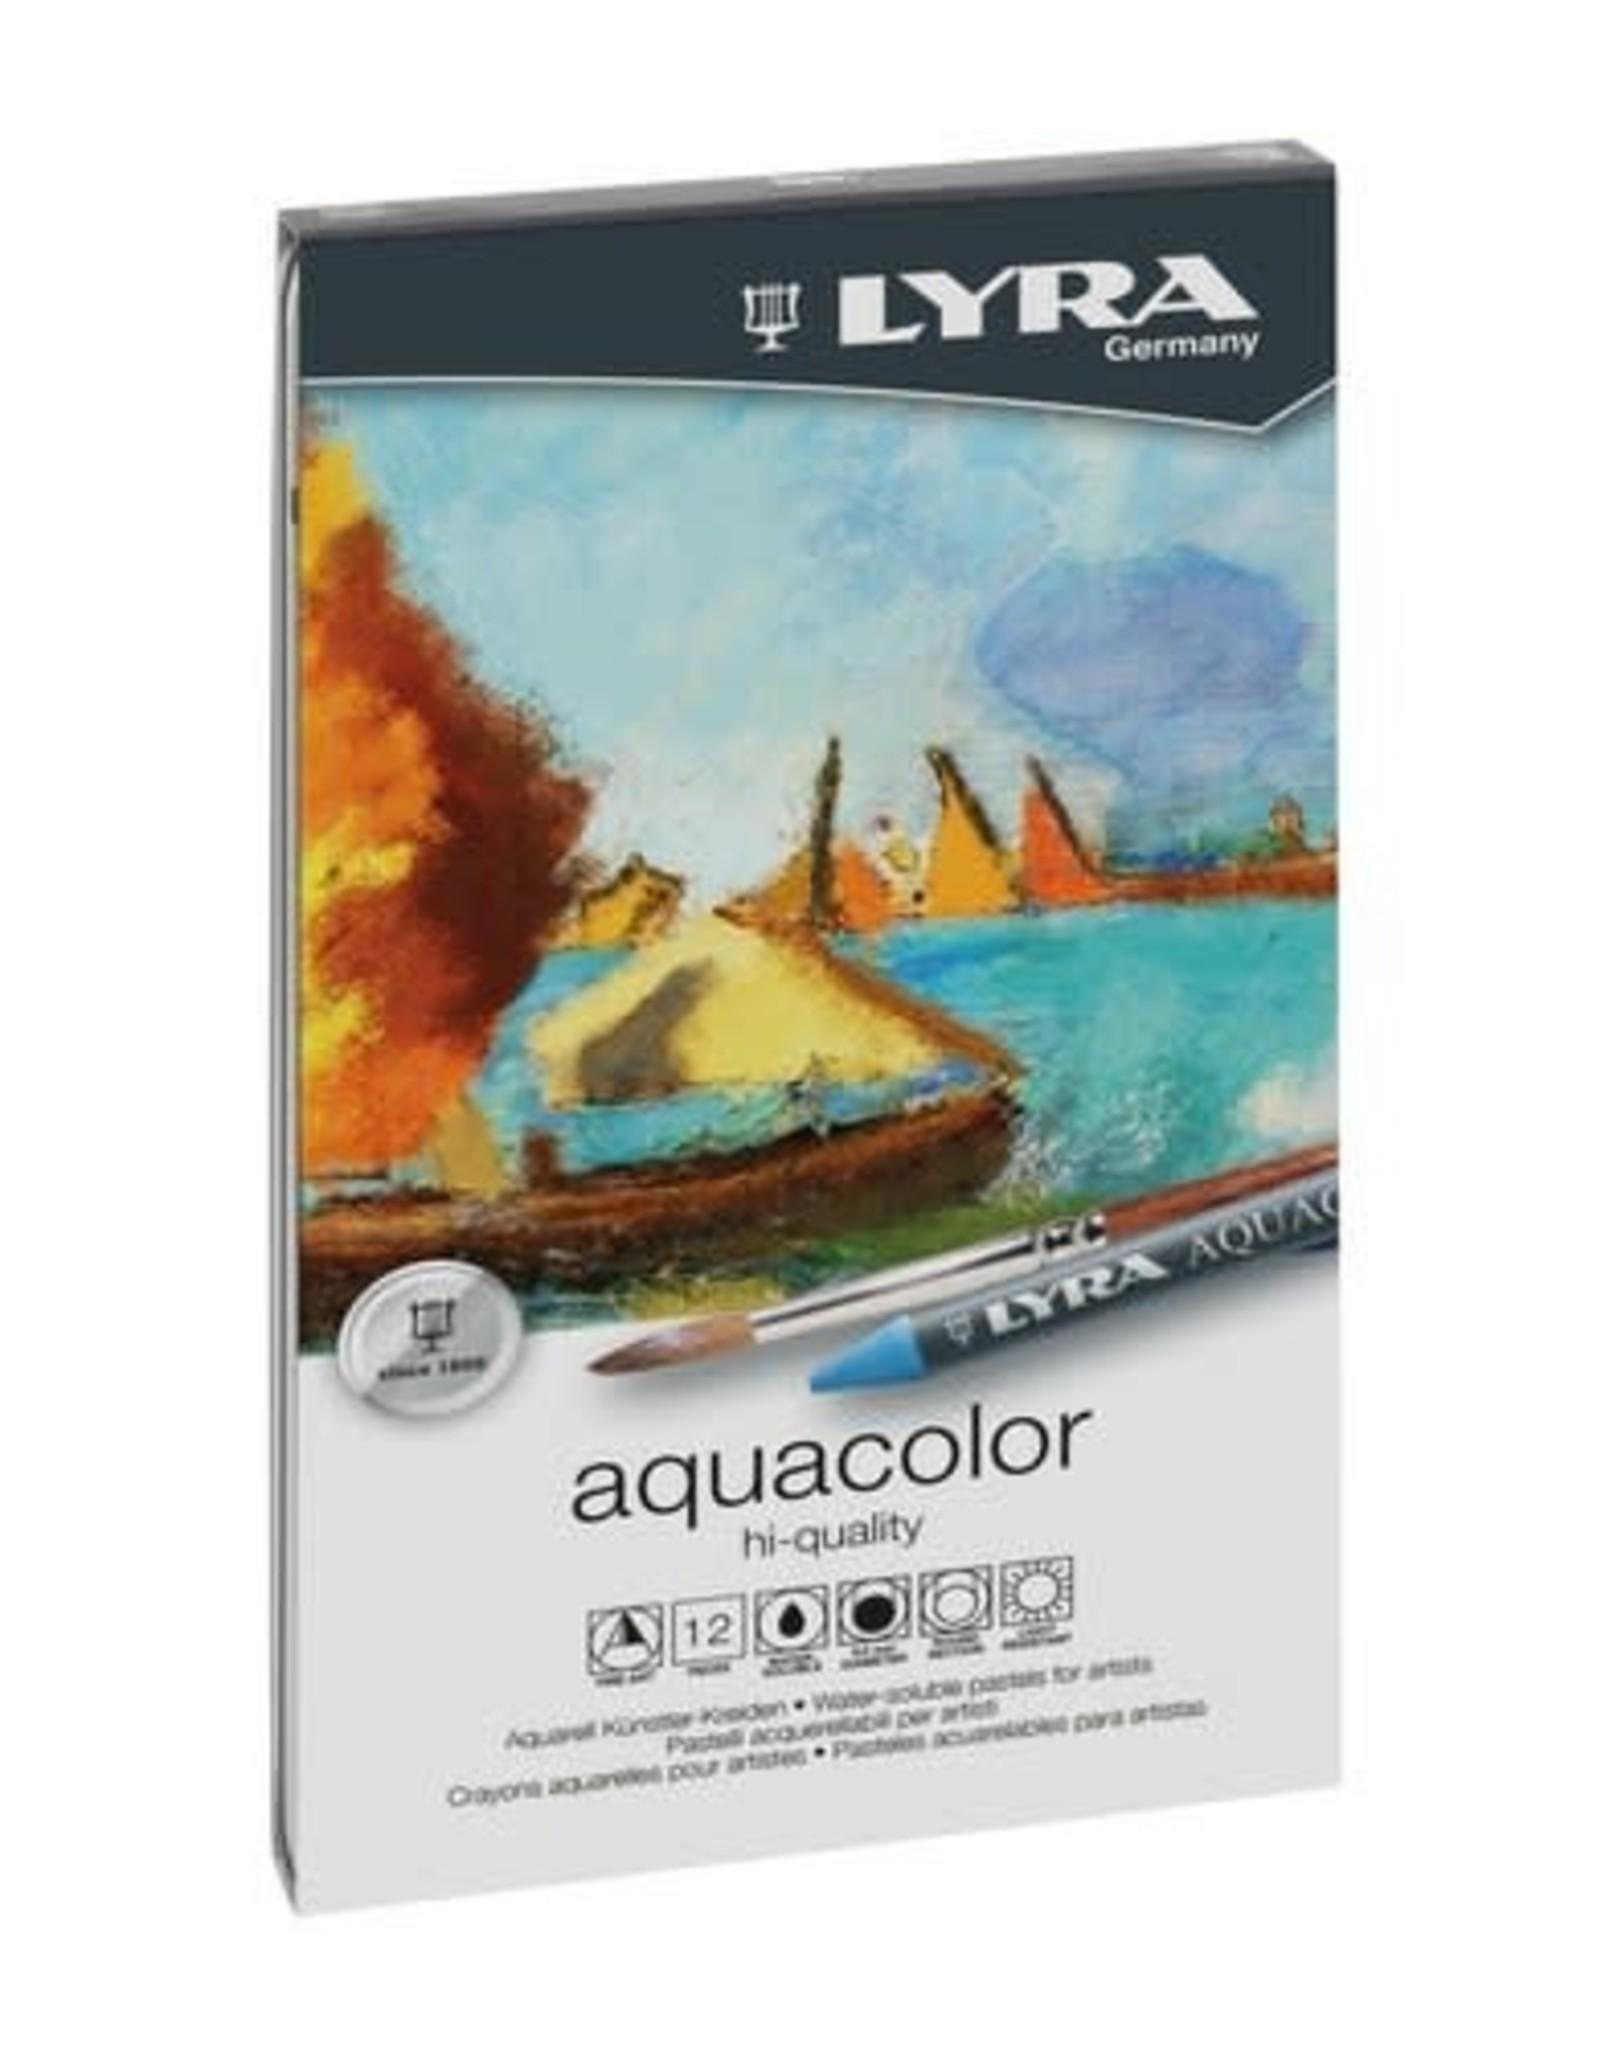 LYRA LYRA Aquacolor Watersoluble Crayons 12pc